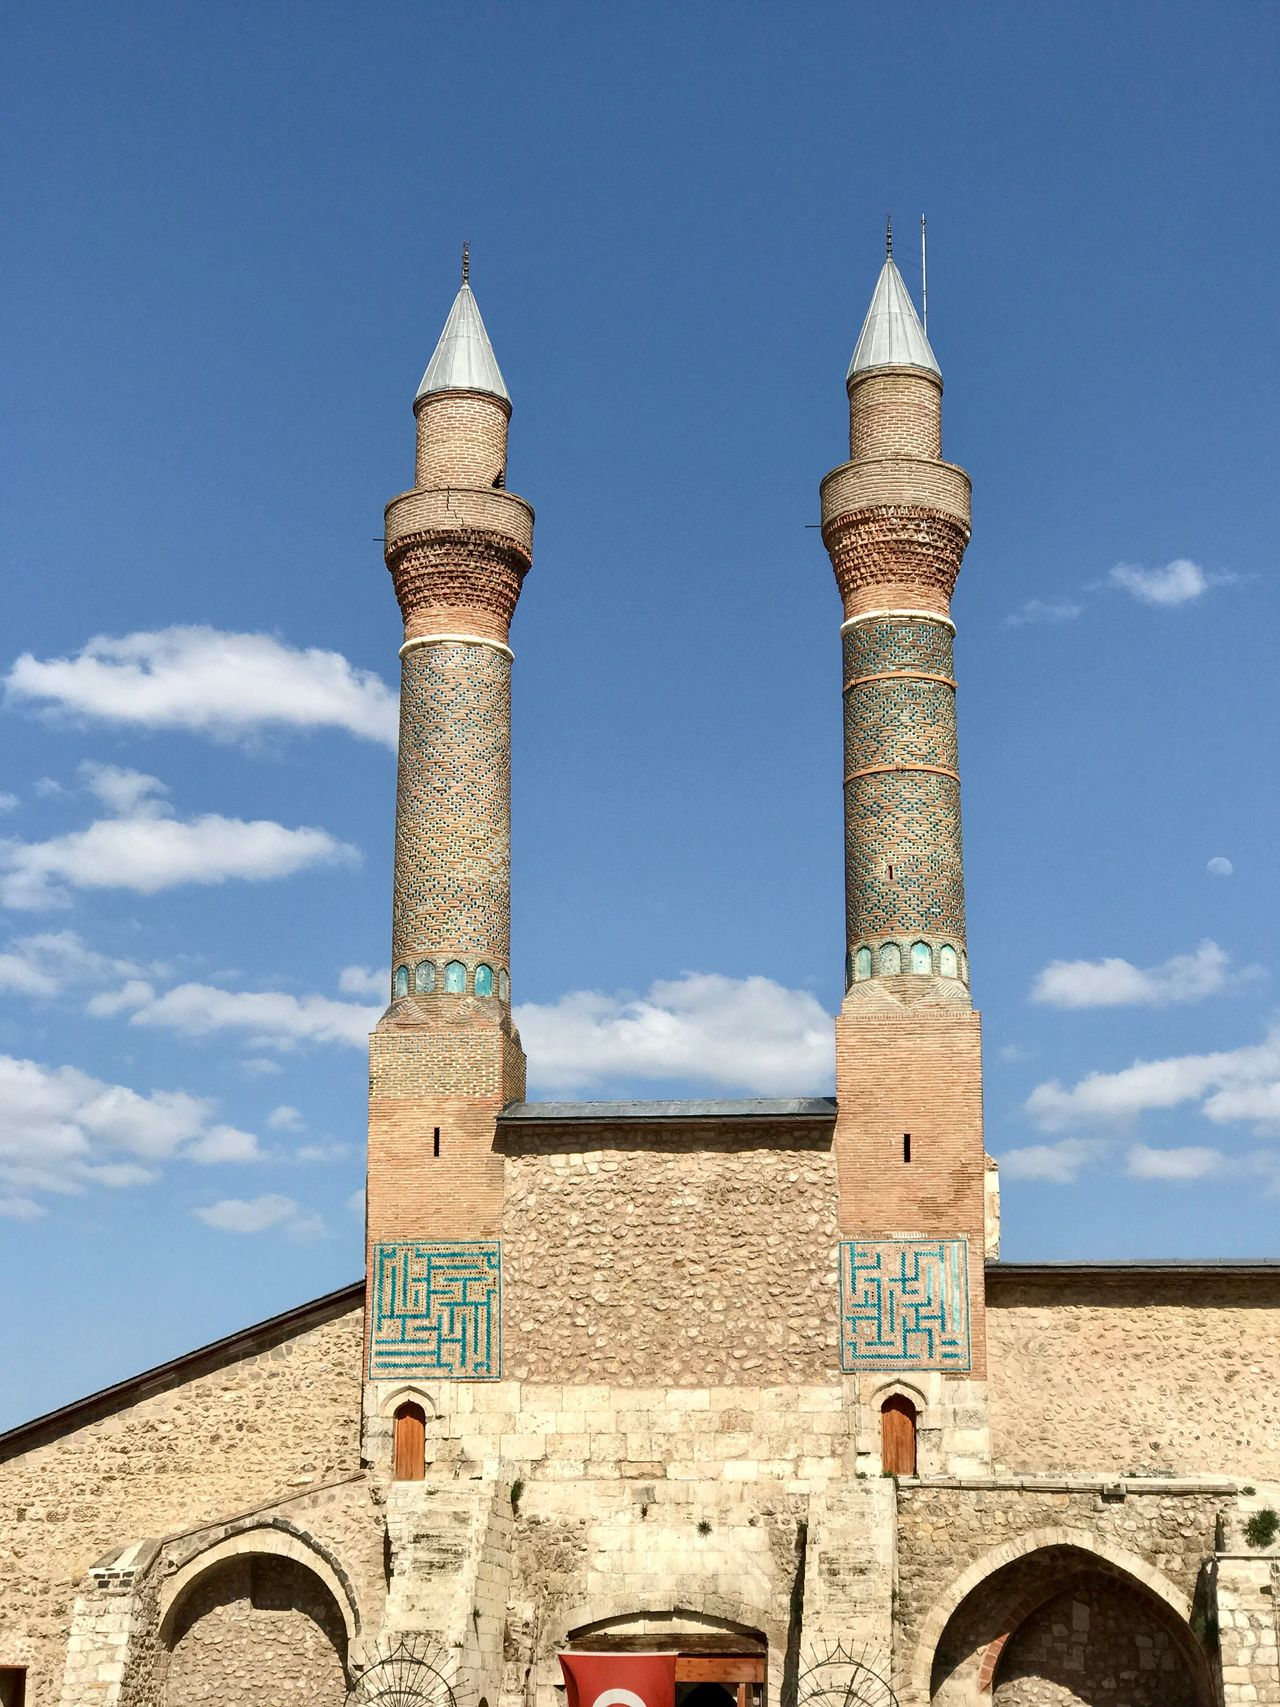 Sivas çifte minare Medrese Sivas Merkez Mosque Islam müslim